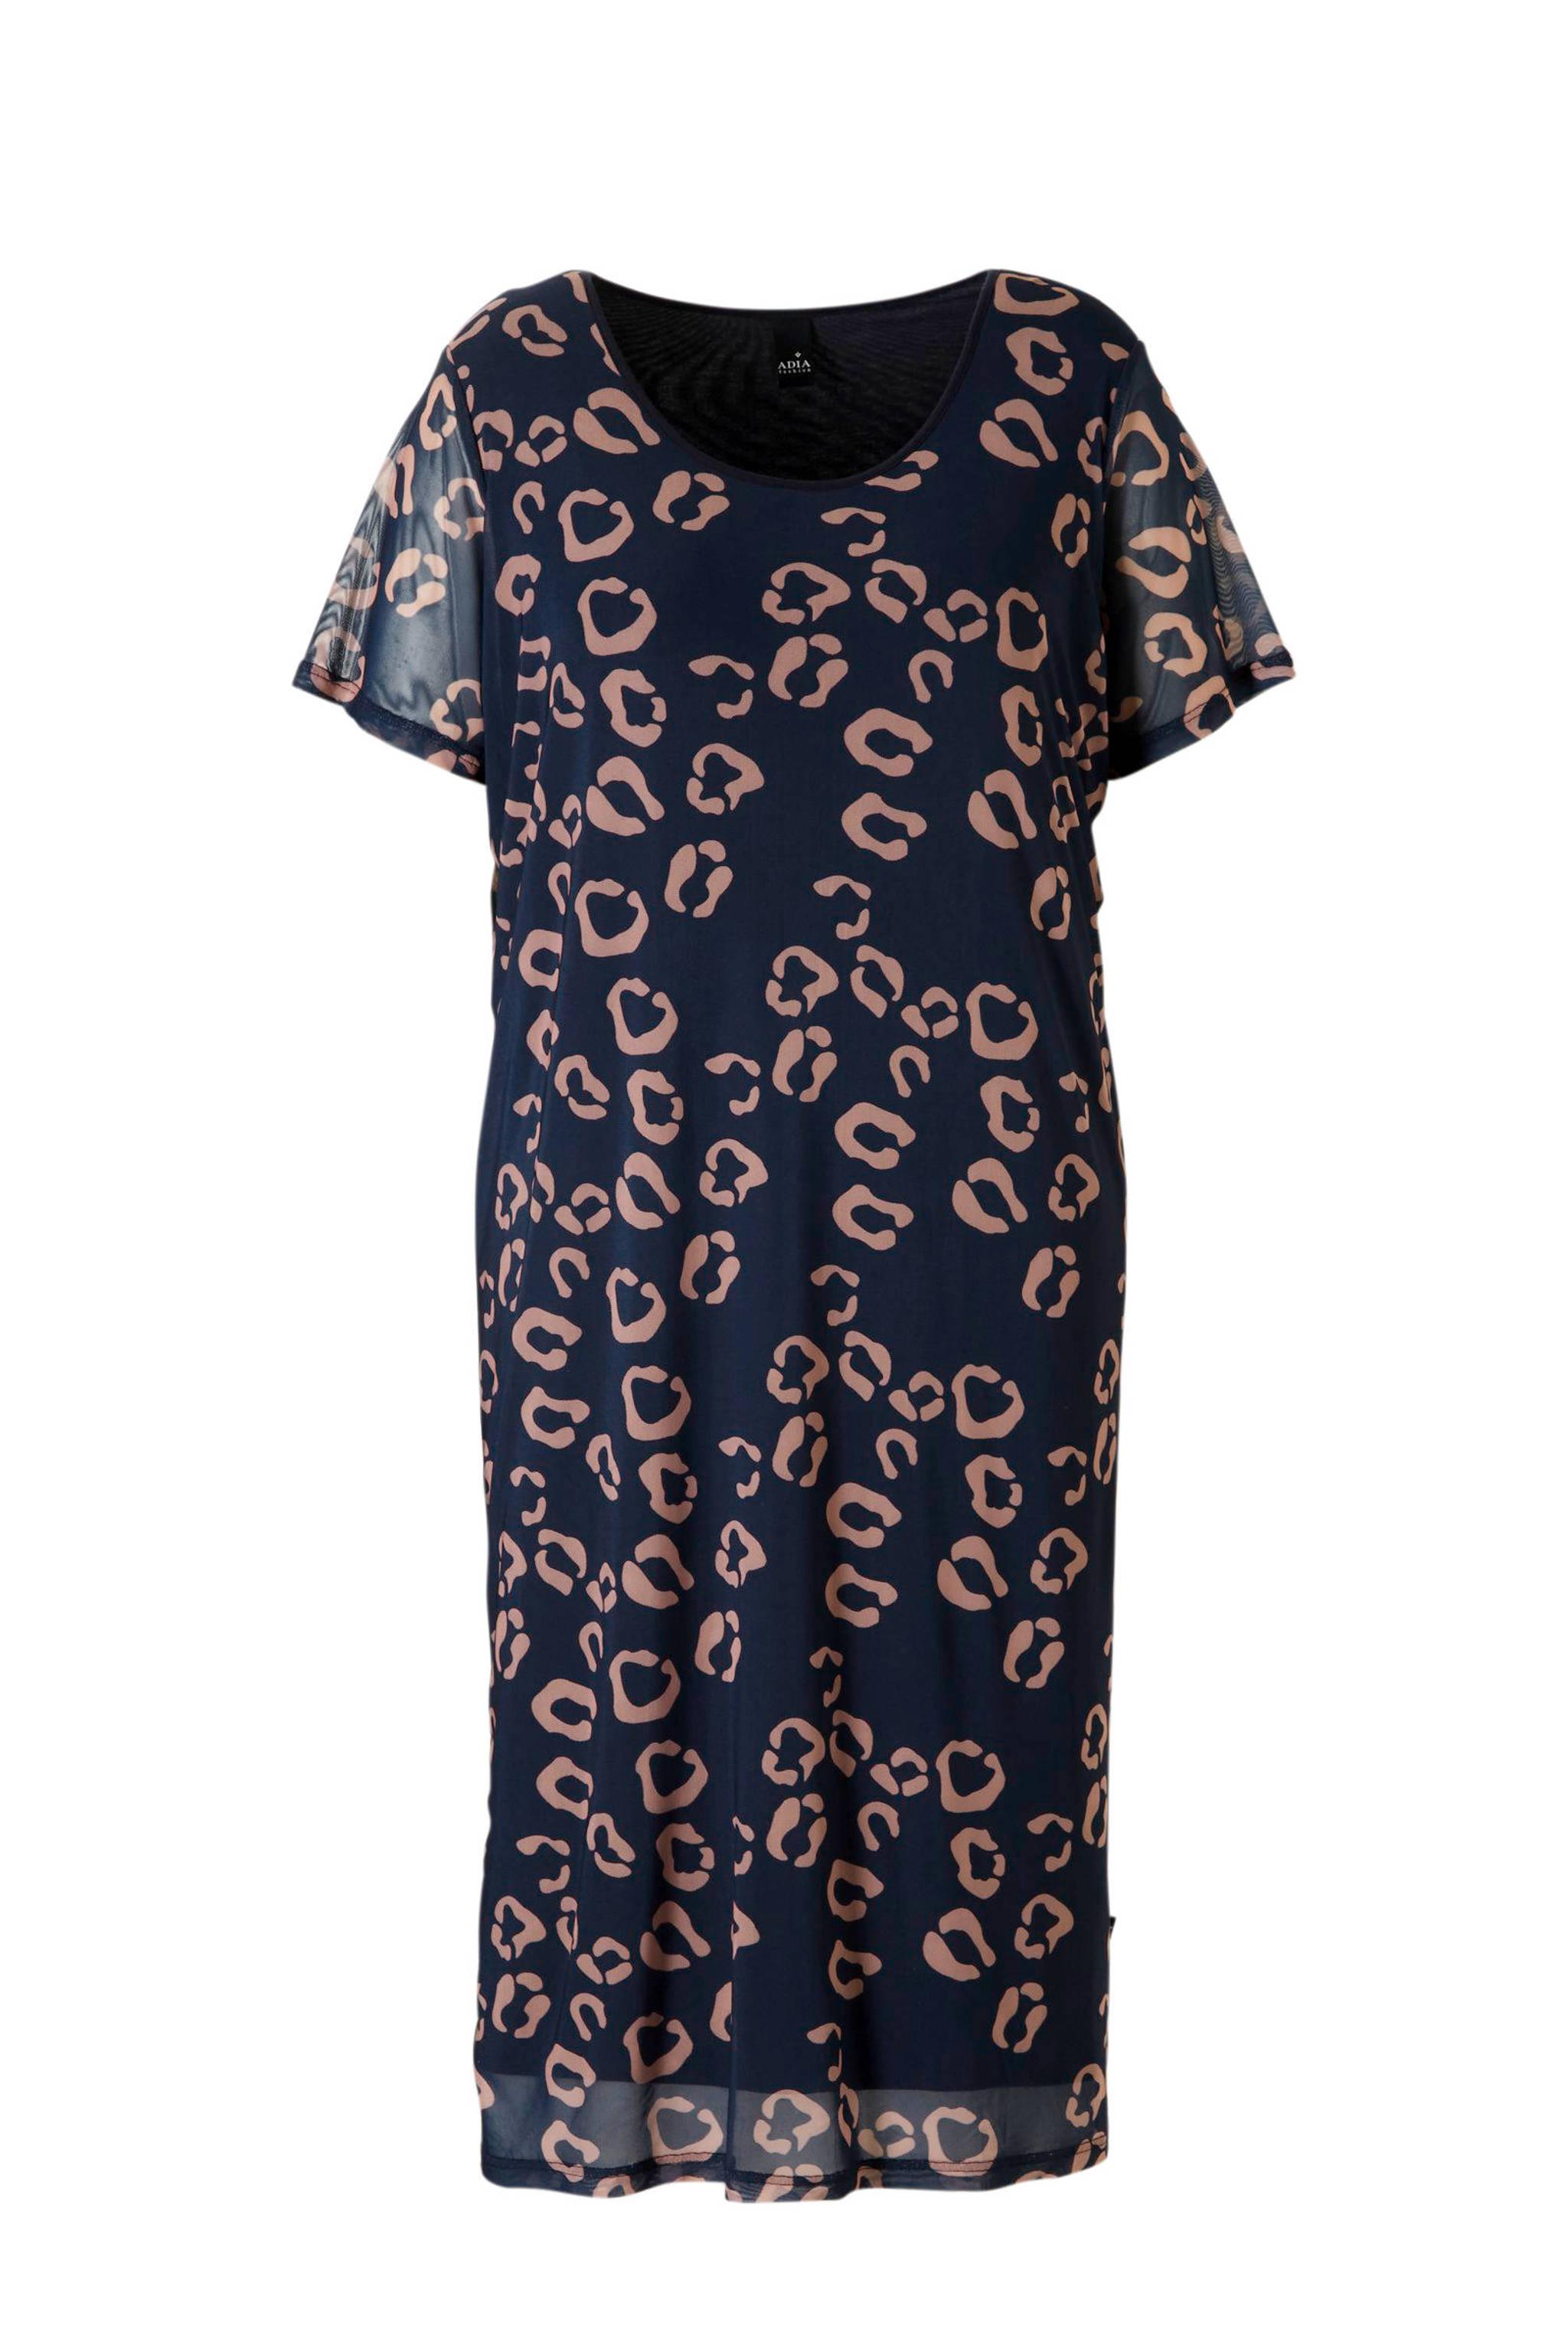 238865cca52c89 Adia jurk met luipaardprint